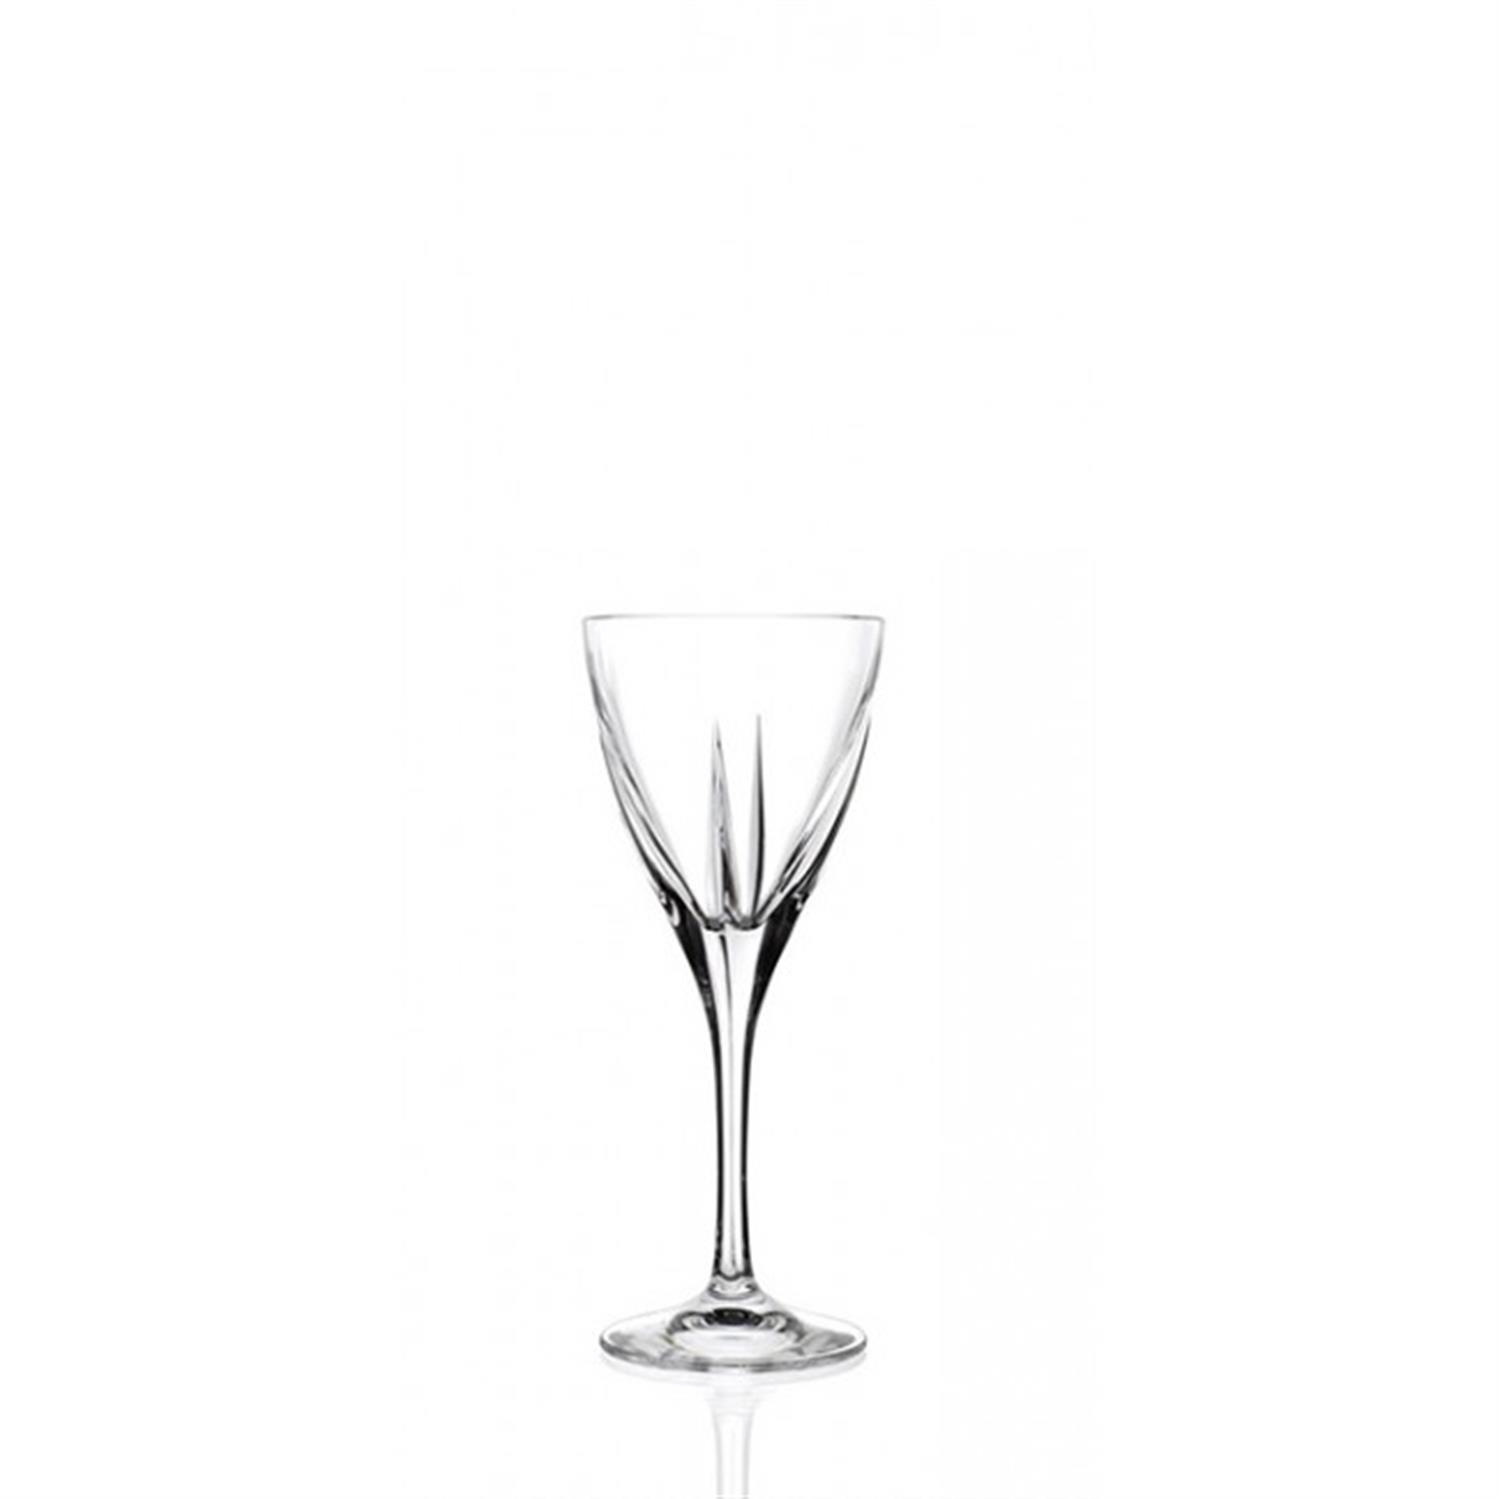 S/6 Ποτήρια λικέρ κρυστάλλινα διάφανα RCR Crystalleria Italiana Fusion 70ml 5.8×14.6εκ